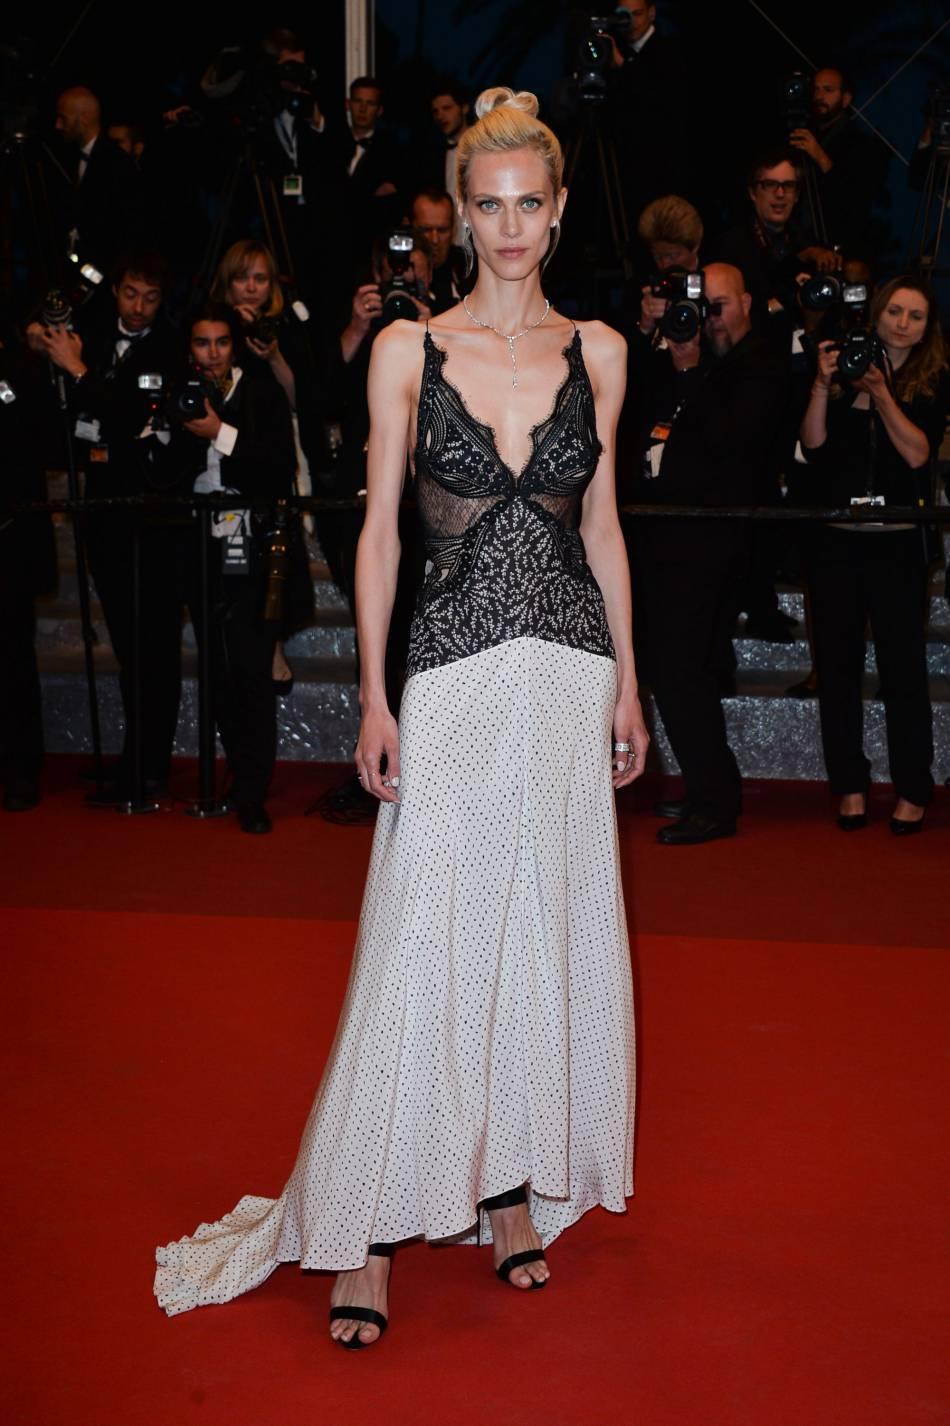 Aymeline Valade était à tomber dans une robe inspiration nuisette.